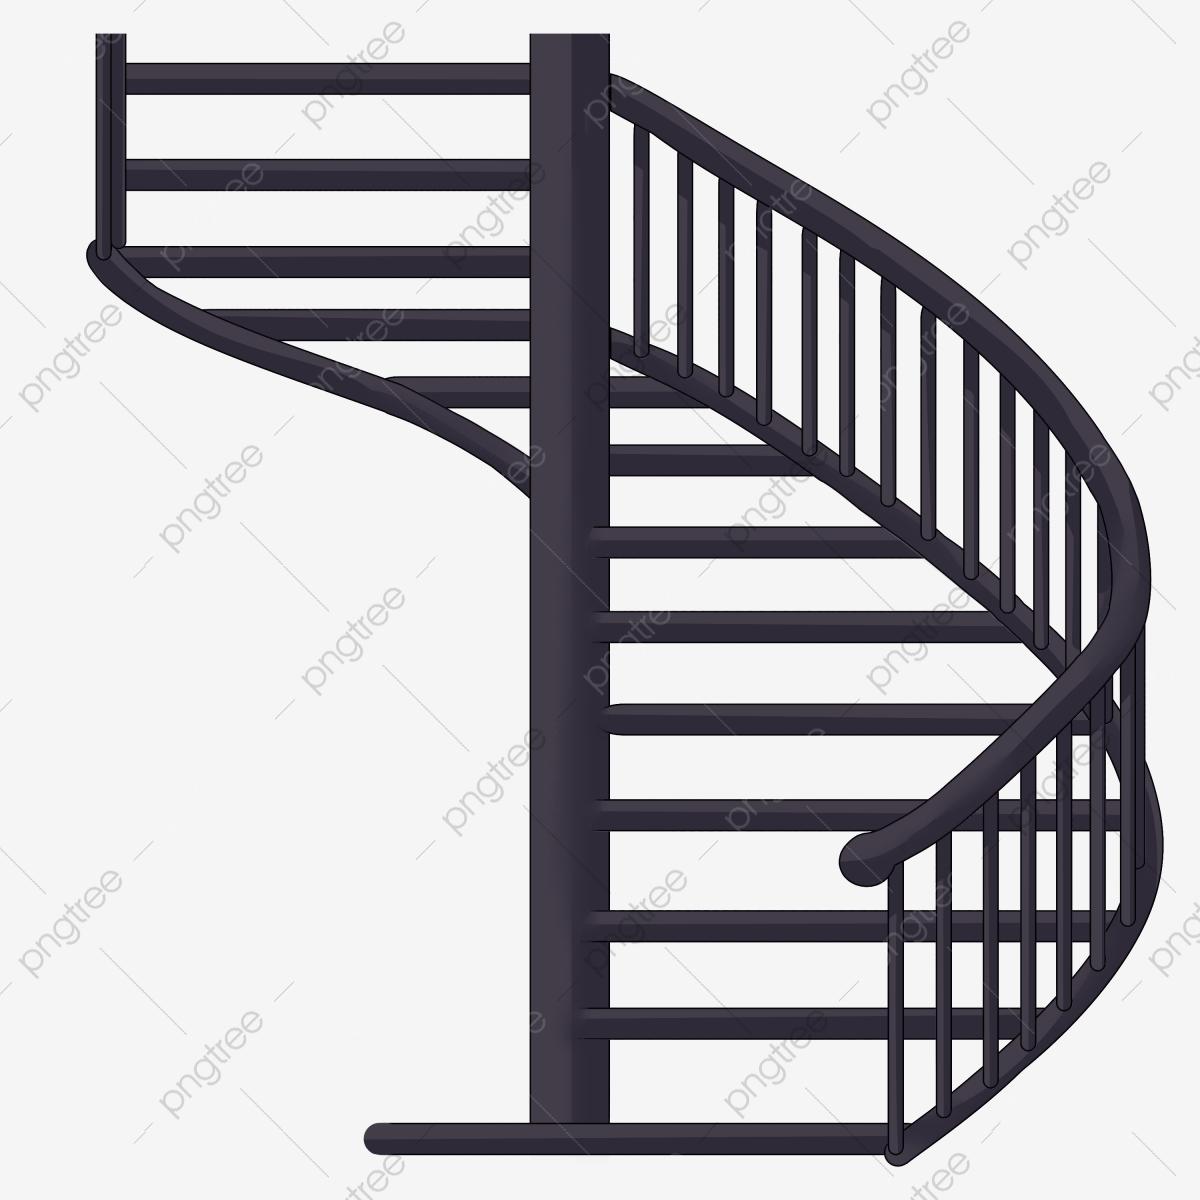 Staircase clipart spiral staircase. Blue illustration black ladder